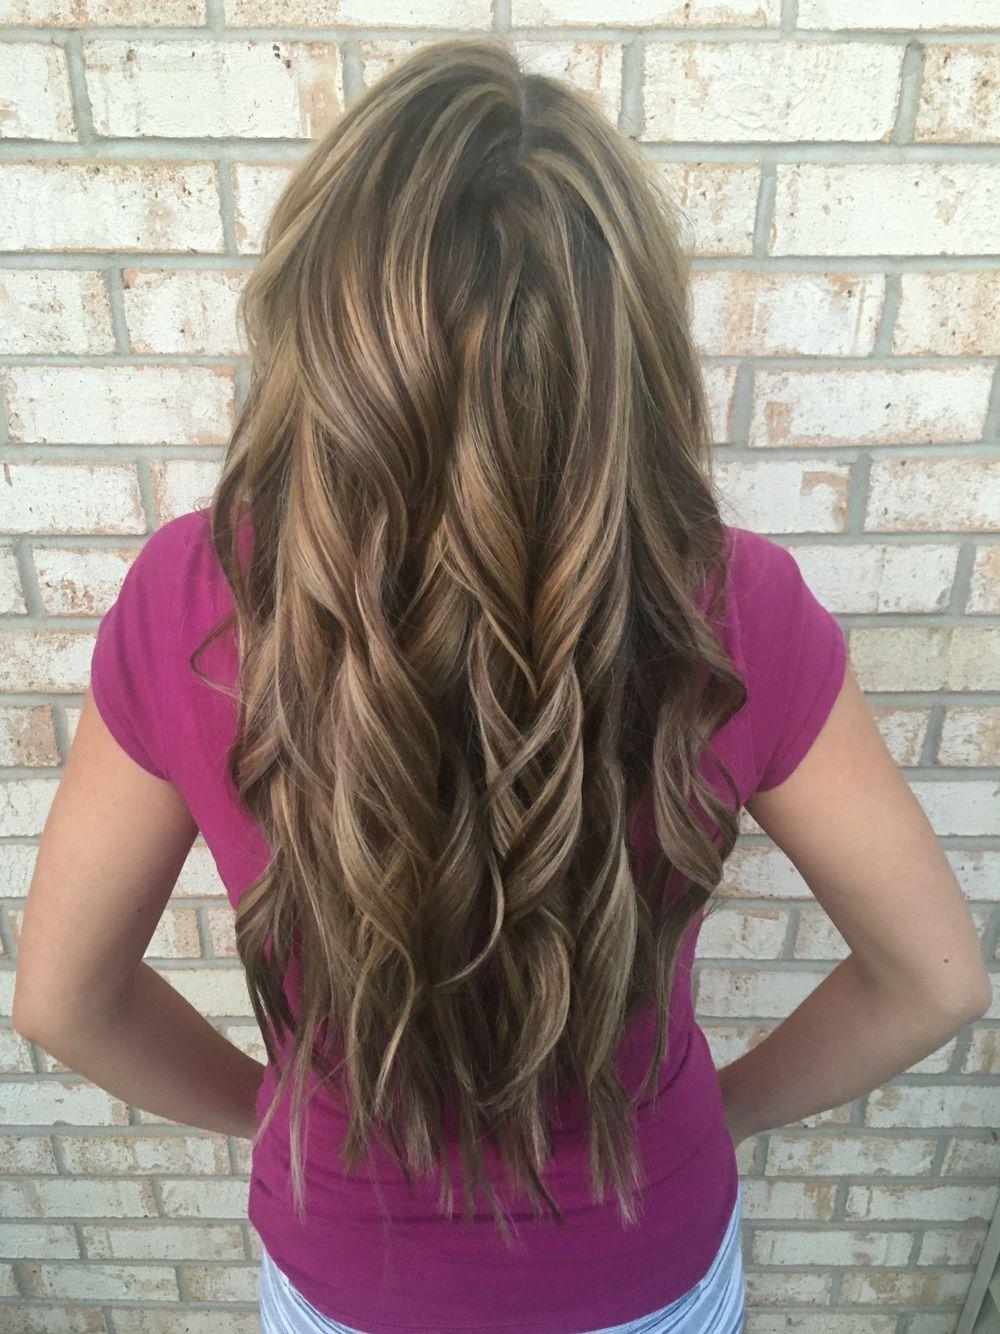 Pin by aleksandra suleski on cute hair pinterest loose curls